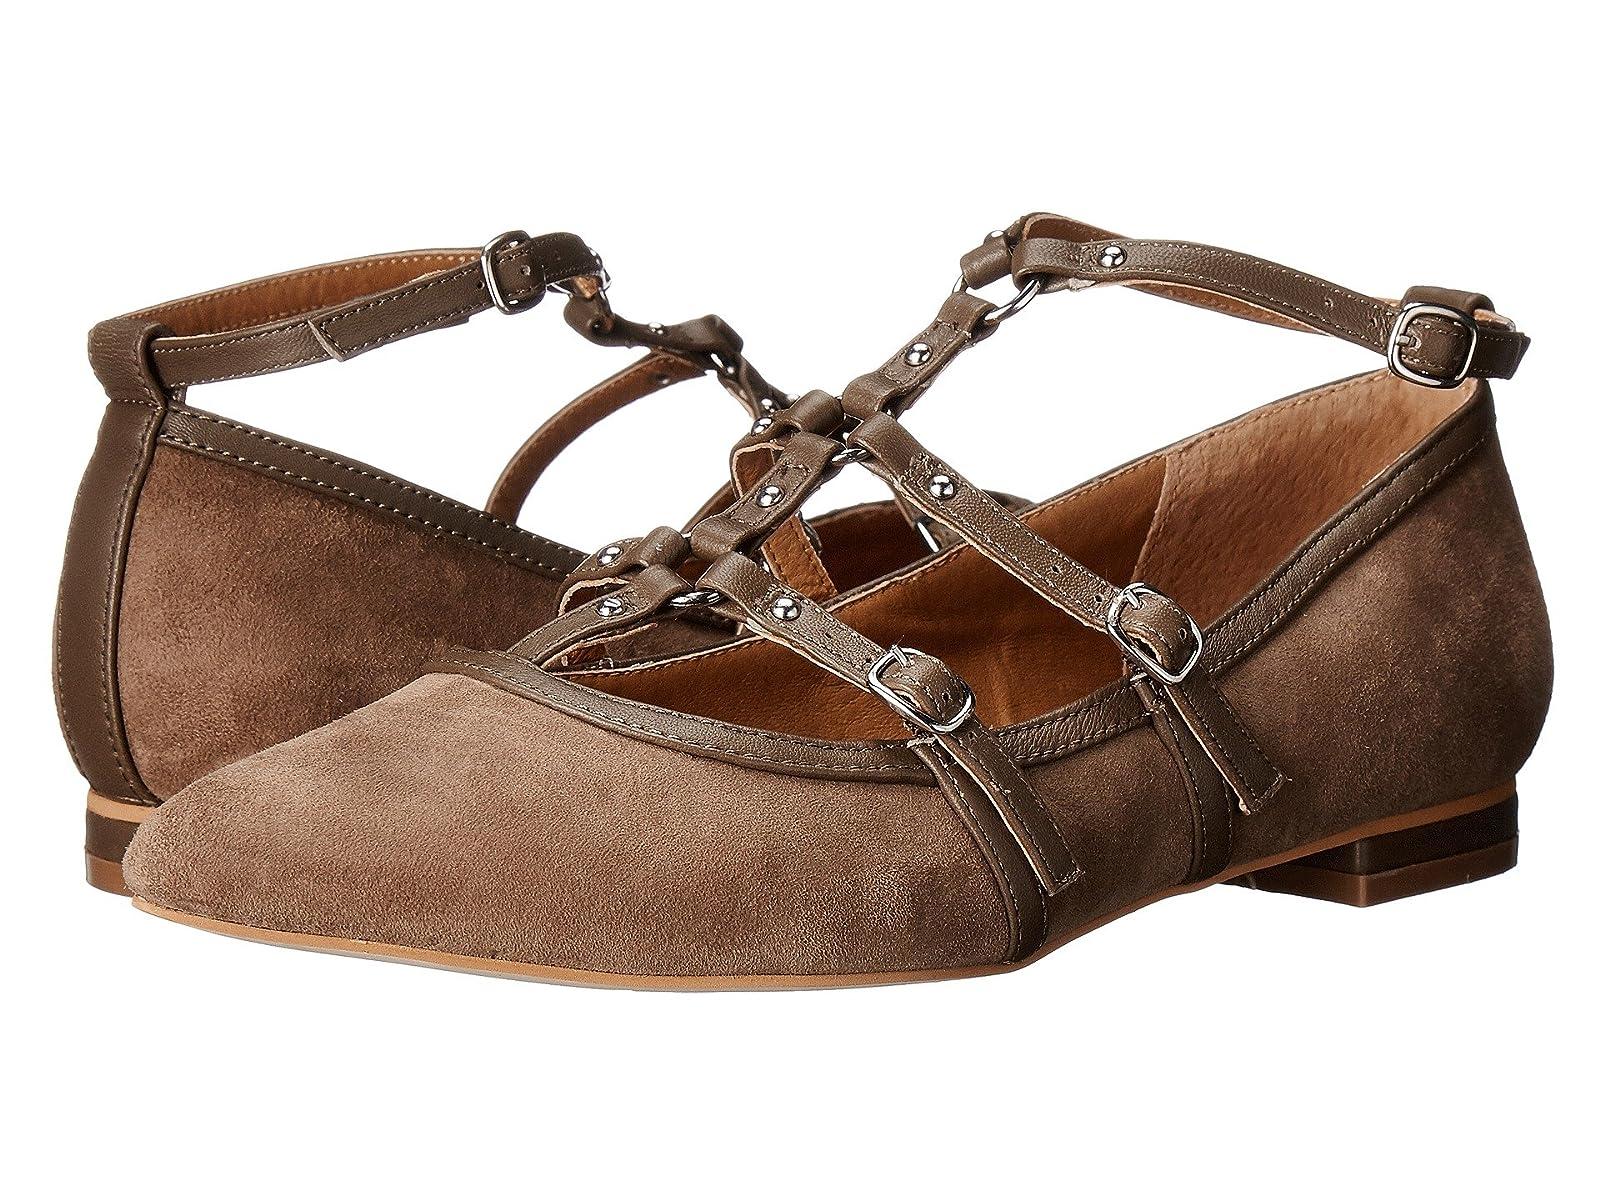 CC Corso Como MinceCheap and distinctive eye-catching shoes